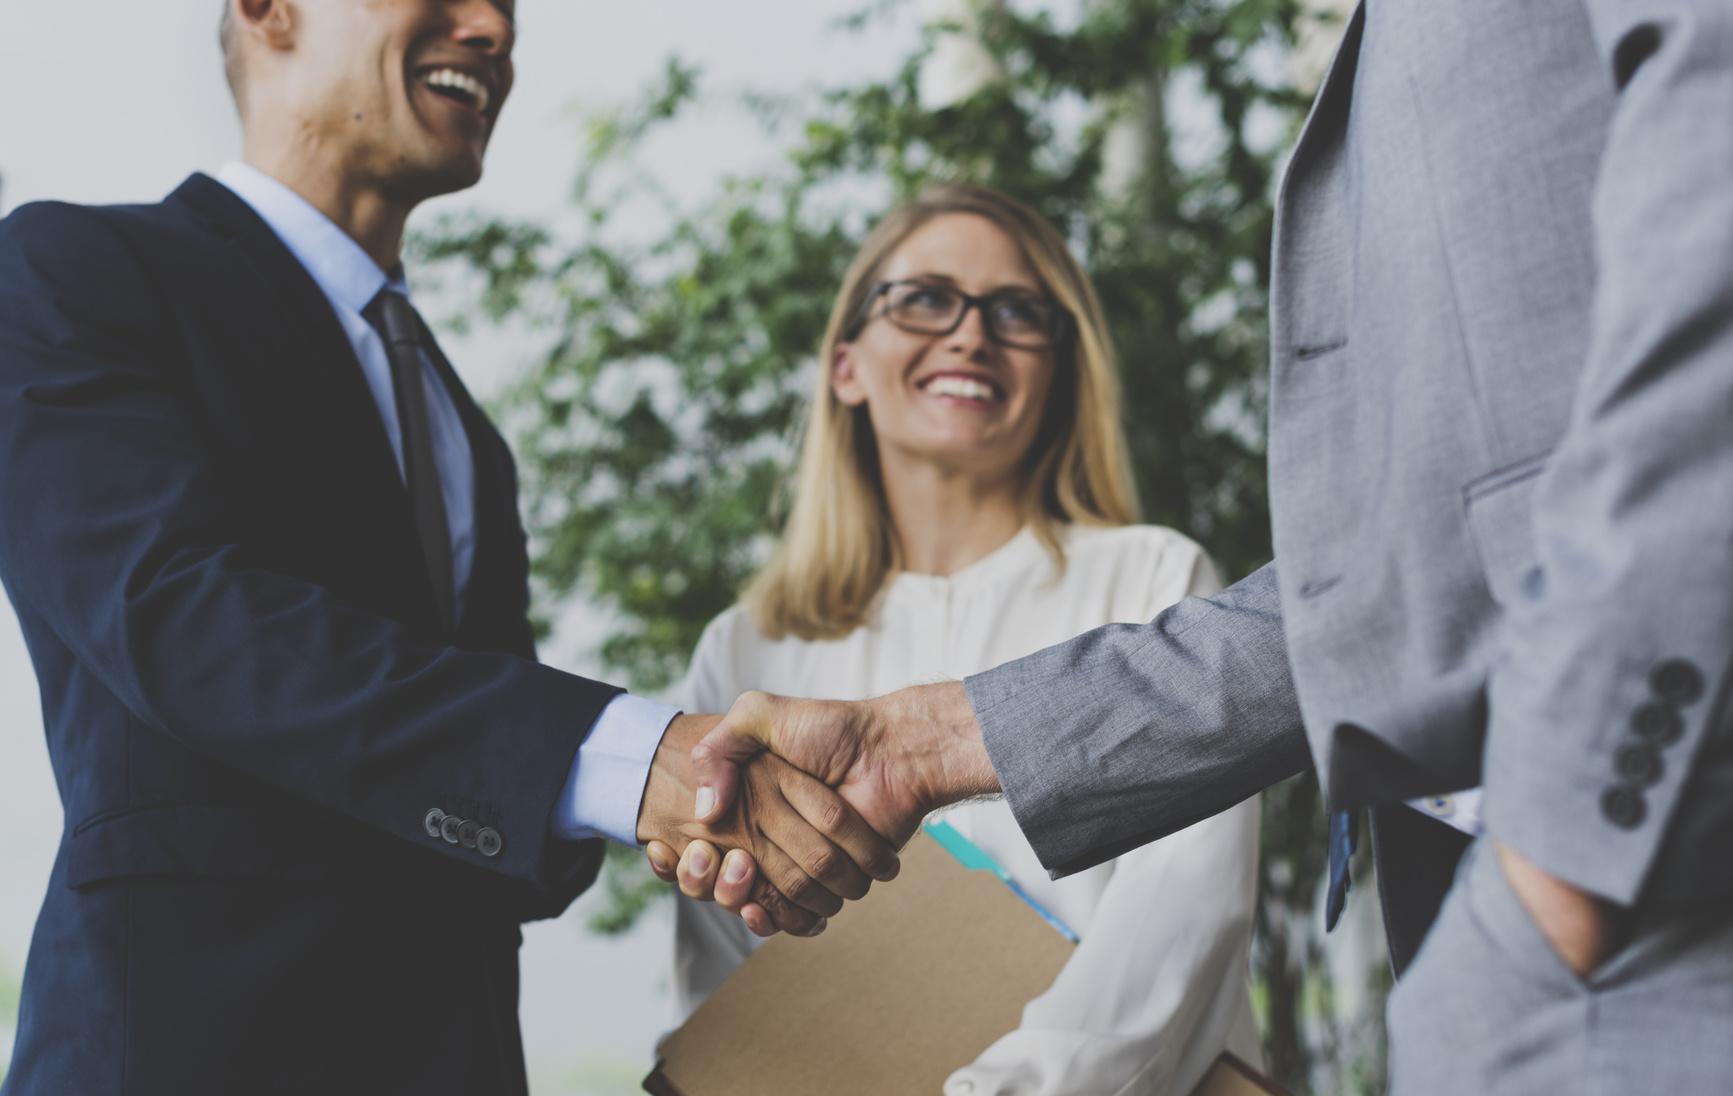 Men Women Business Agreement Hands Shake